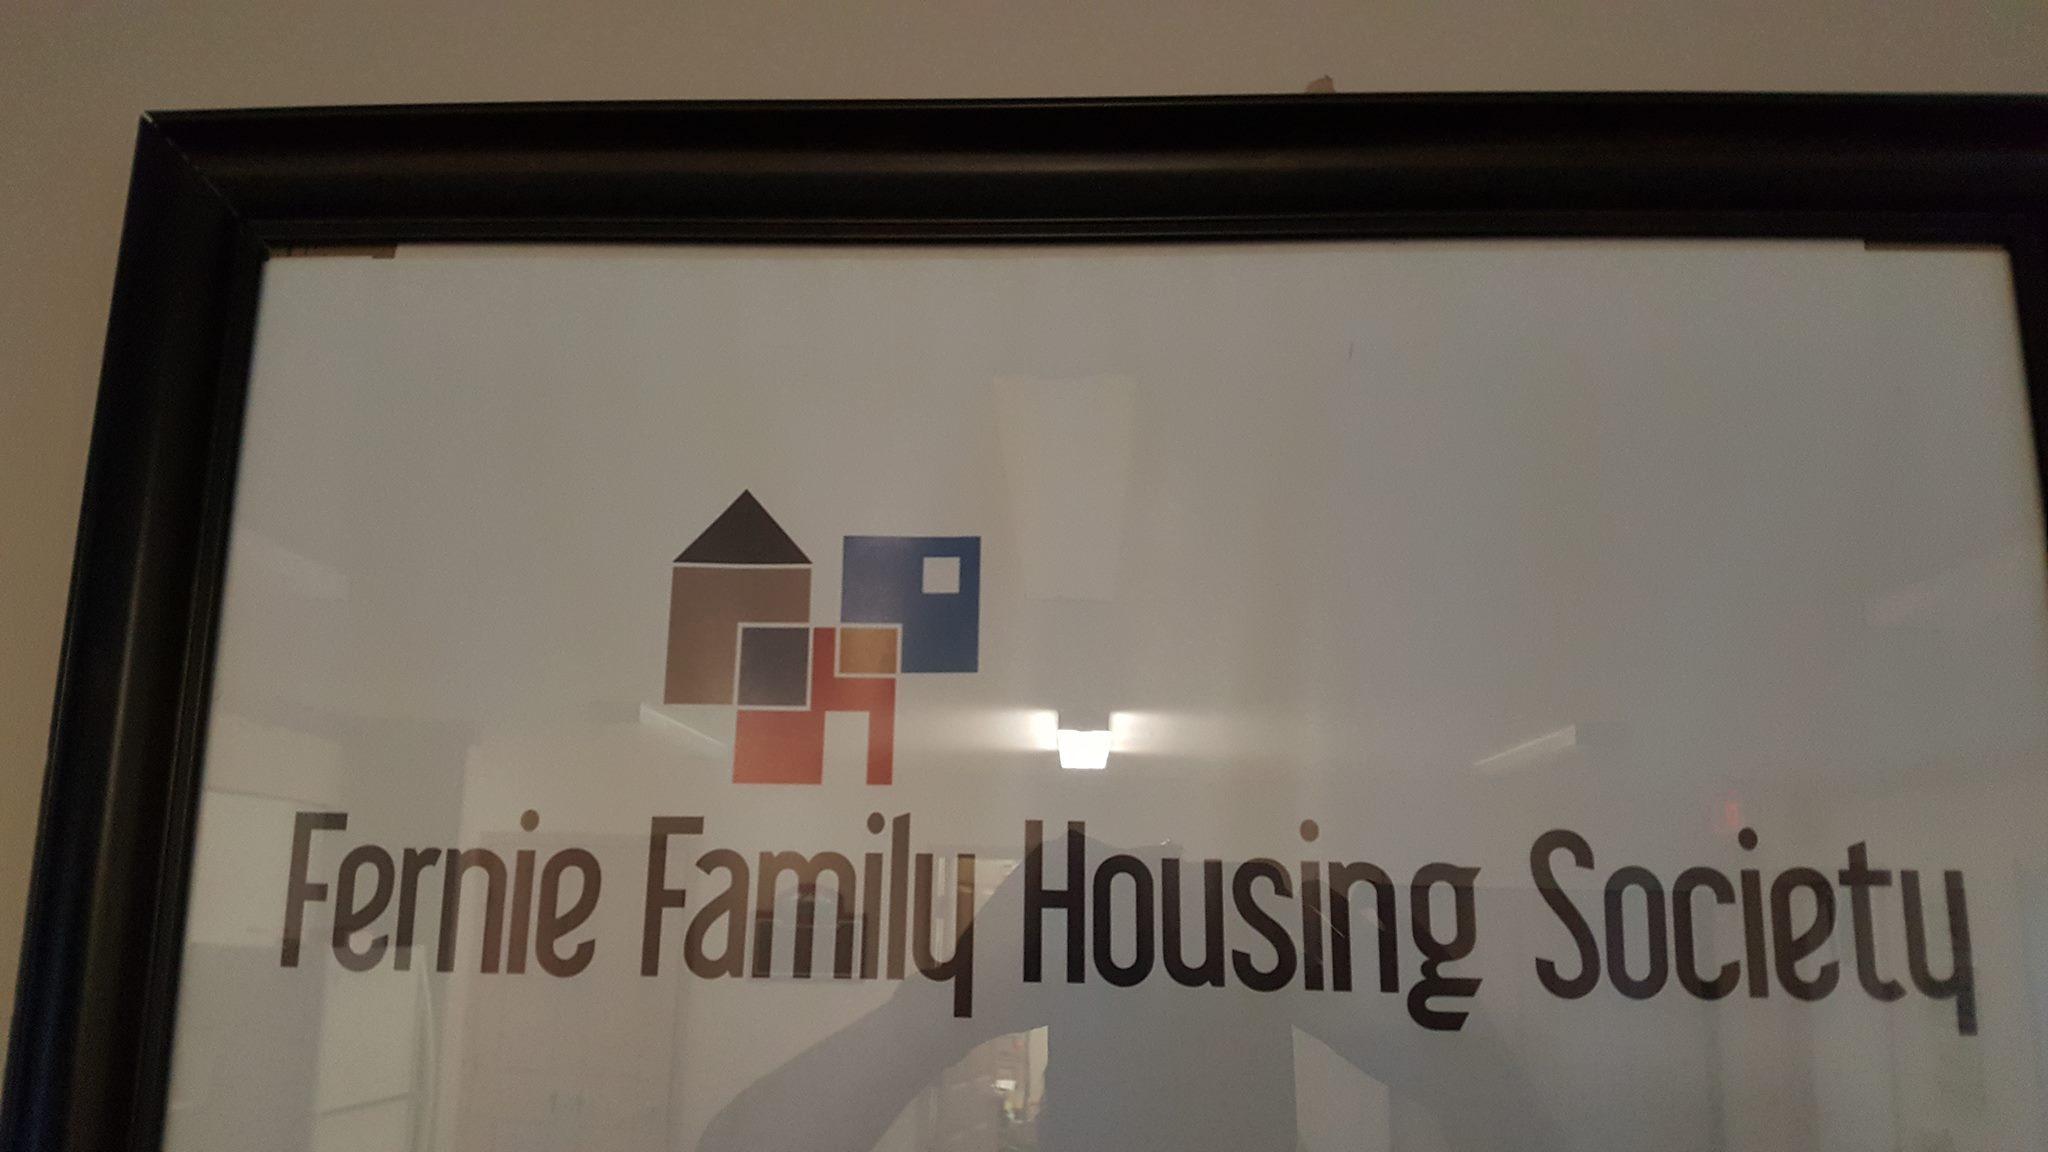 Fernie Family Housing Society begins preliminary work on new development